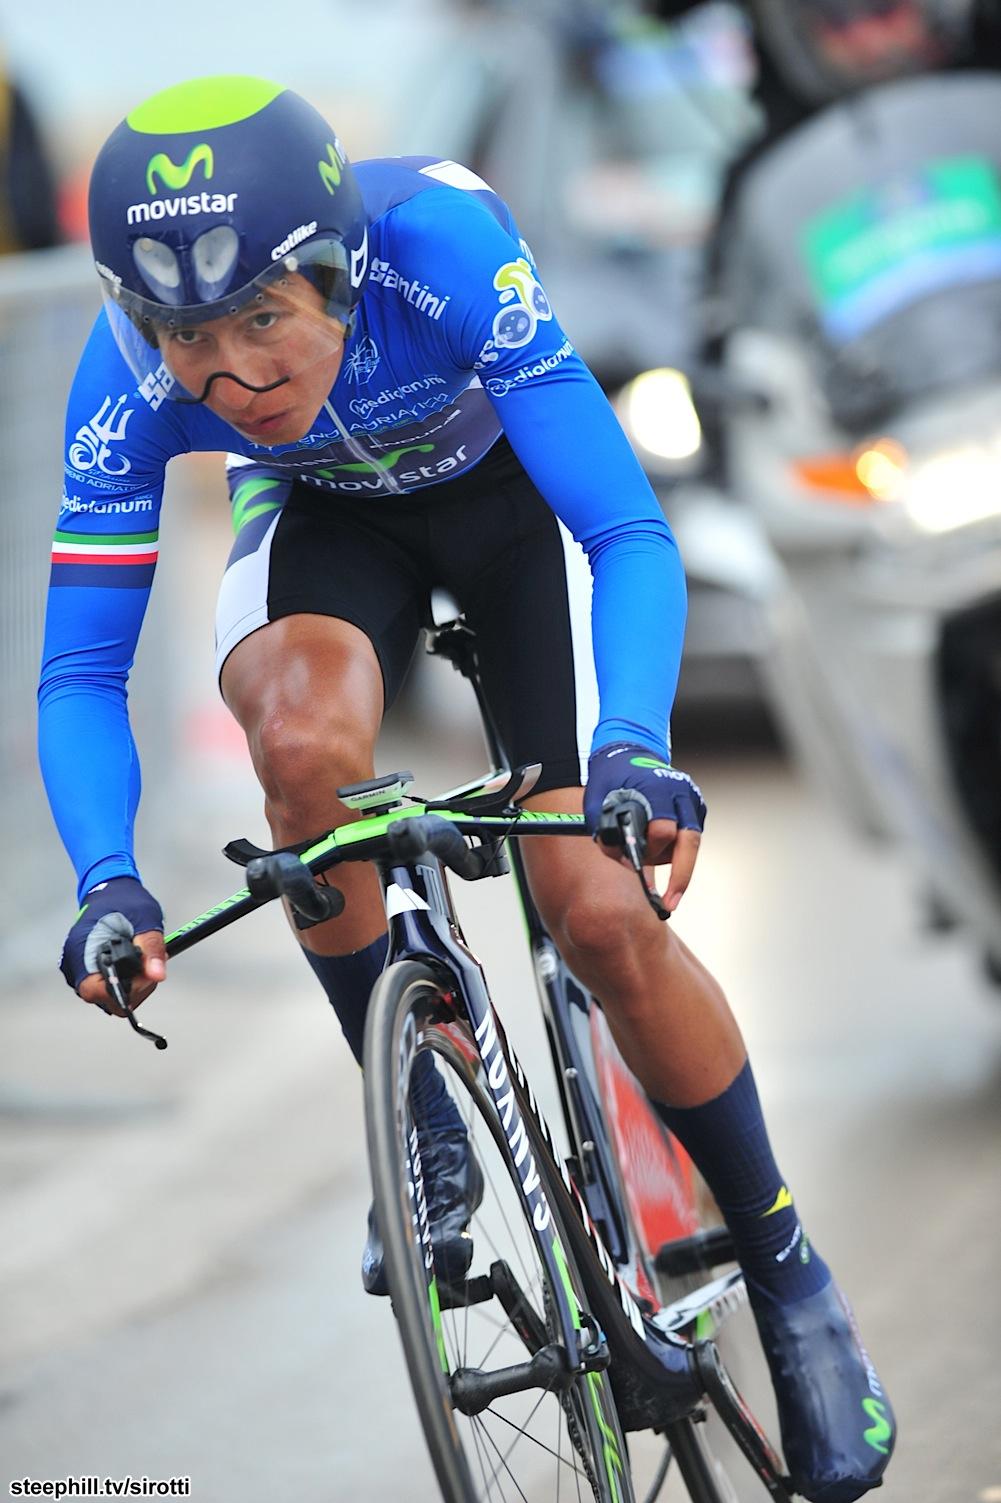 Tirreno Adriatico-2015  - Página 6 317-PIC525594300